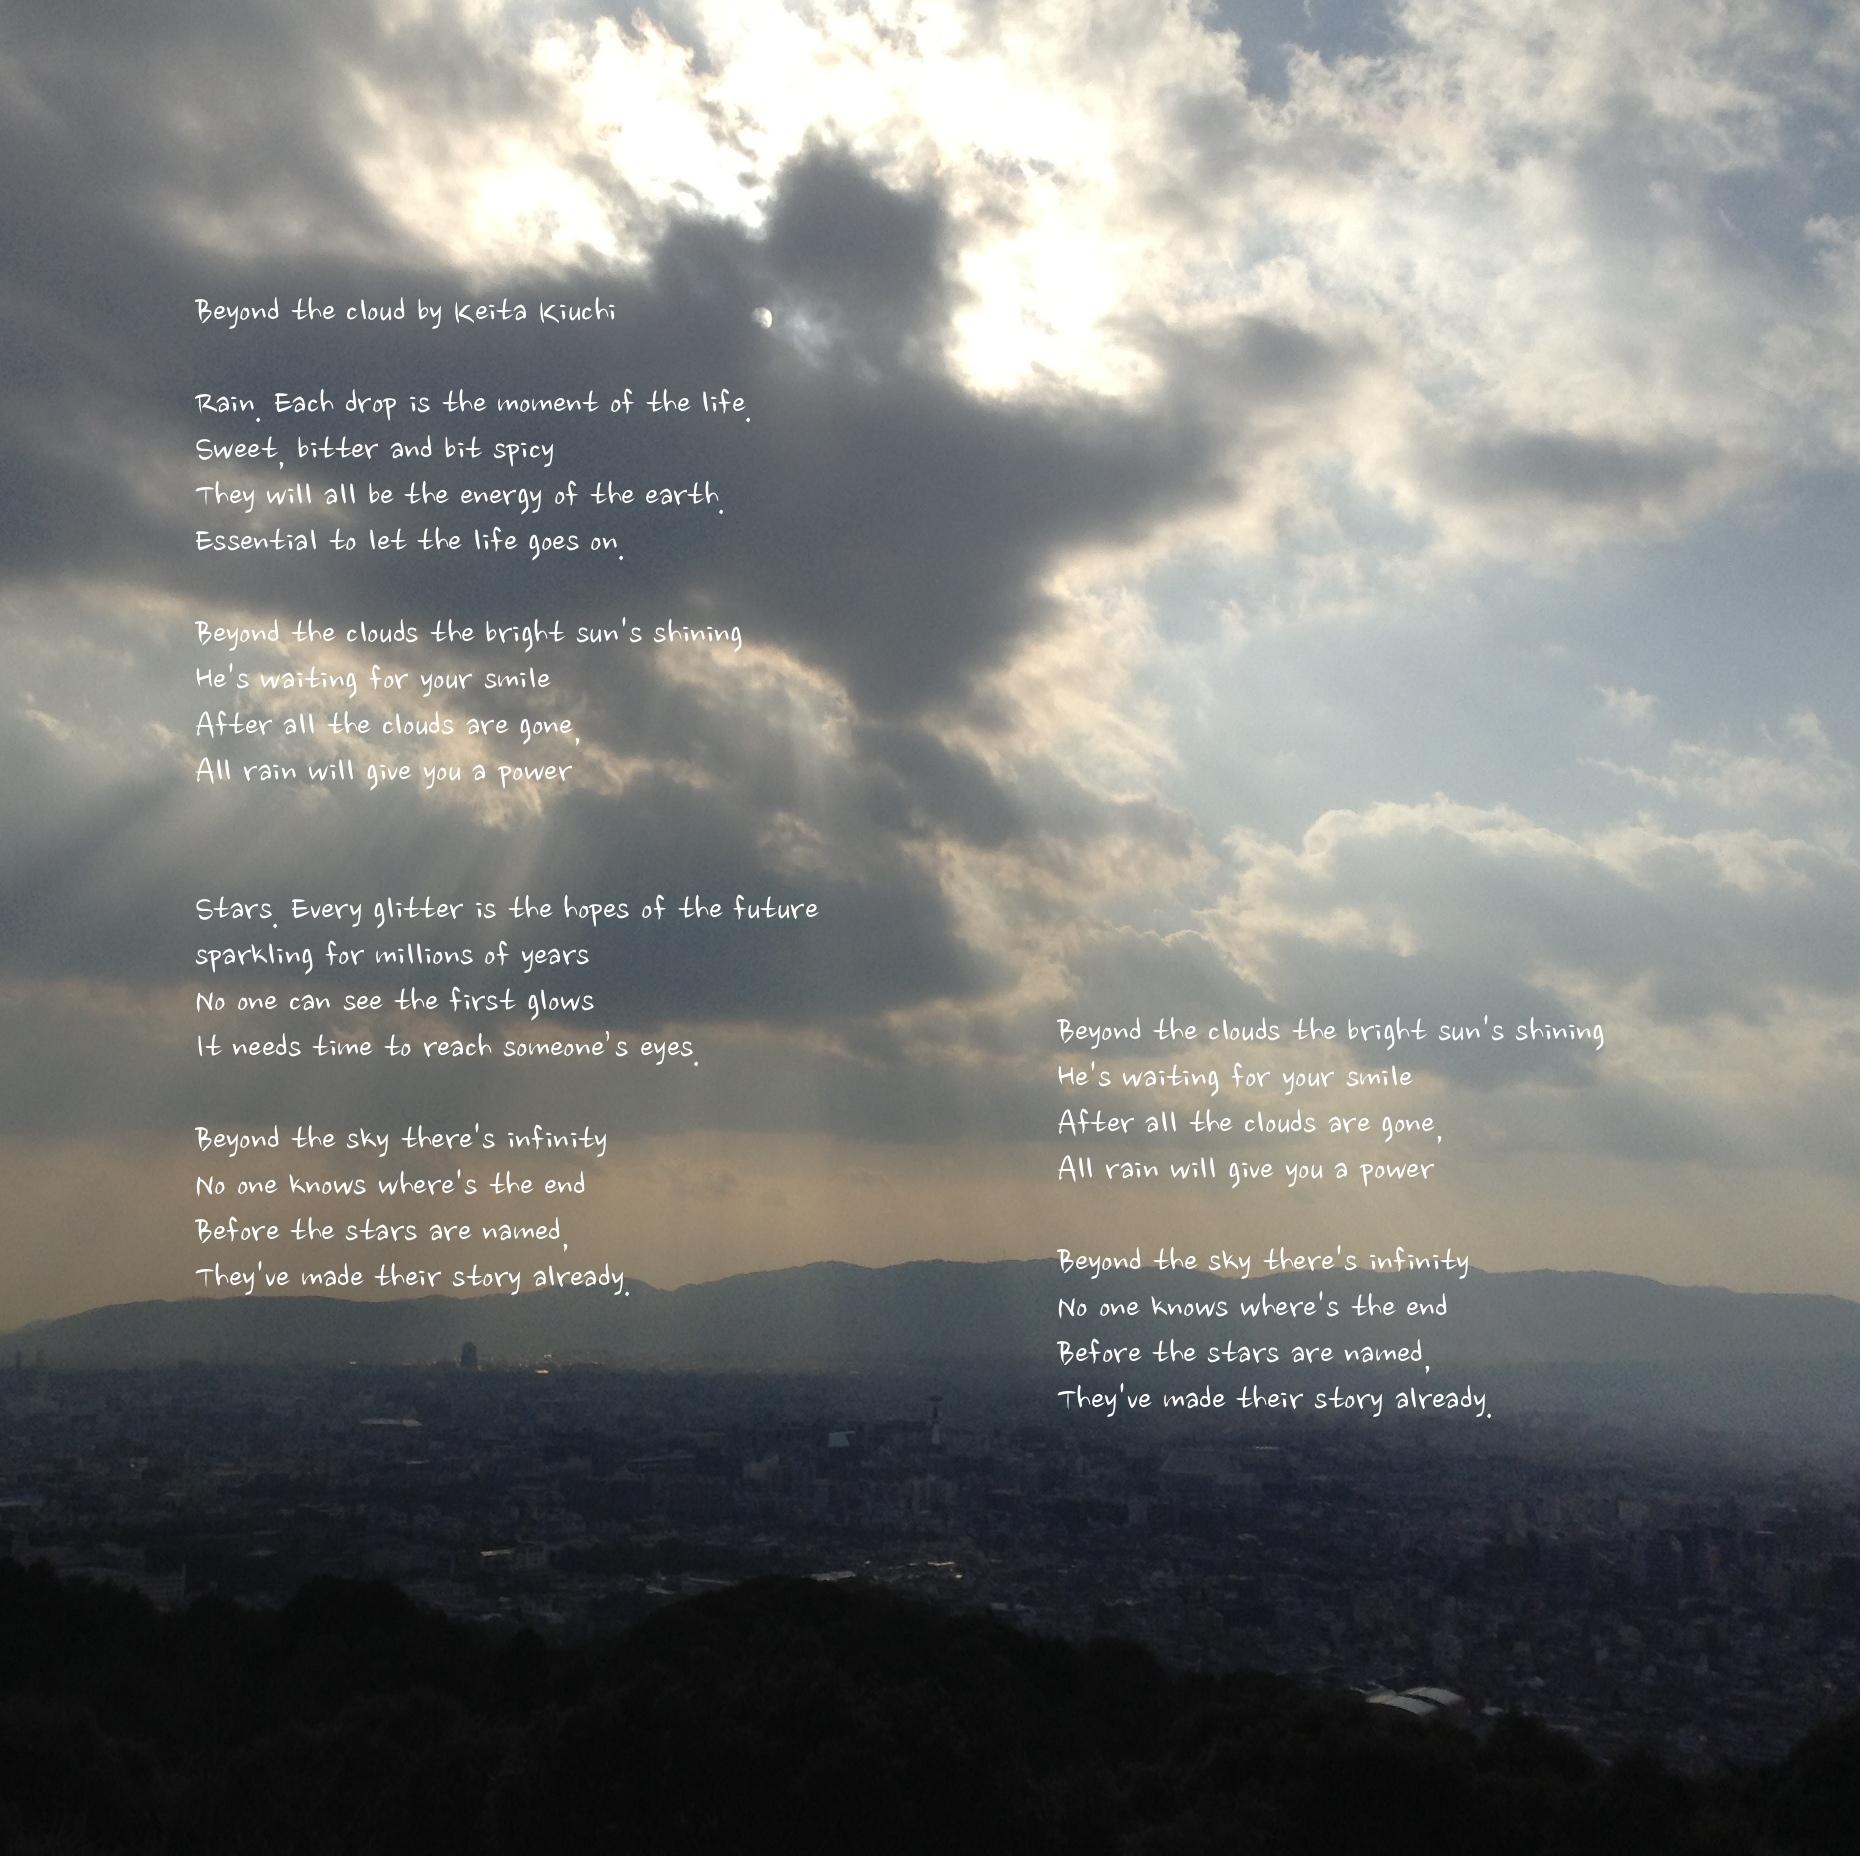 Beyond the clouds.lyrics card.JPG